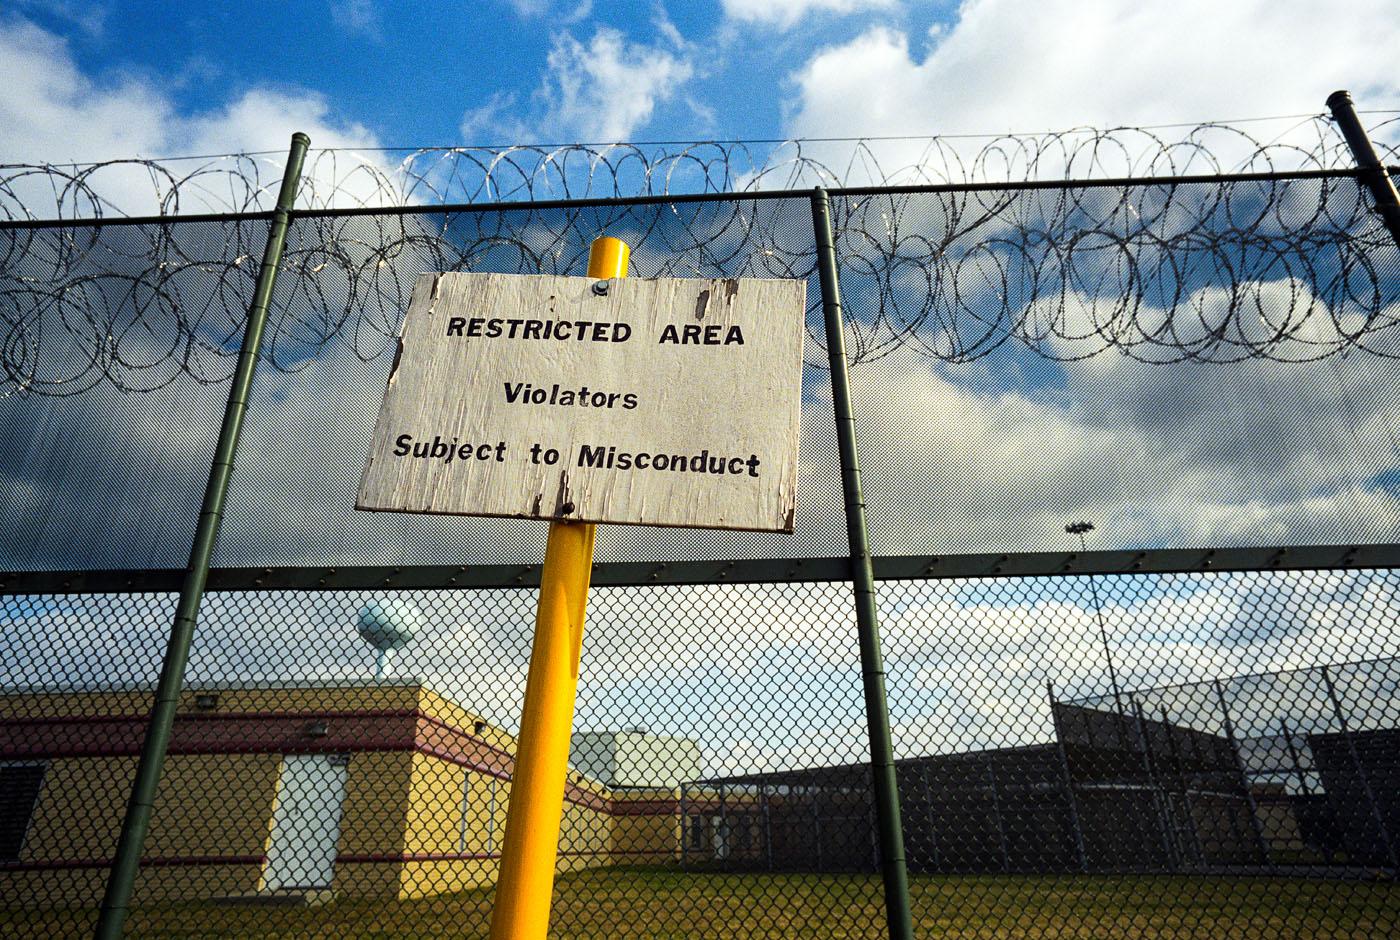 Graterford Prison